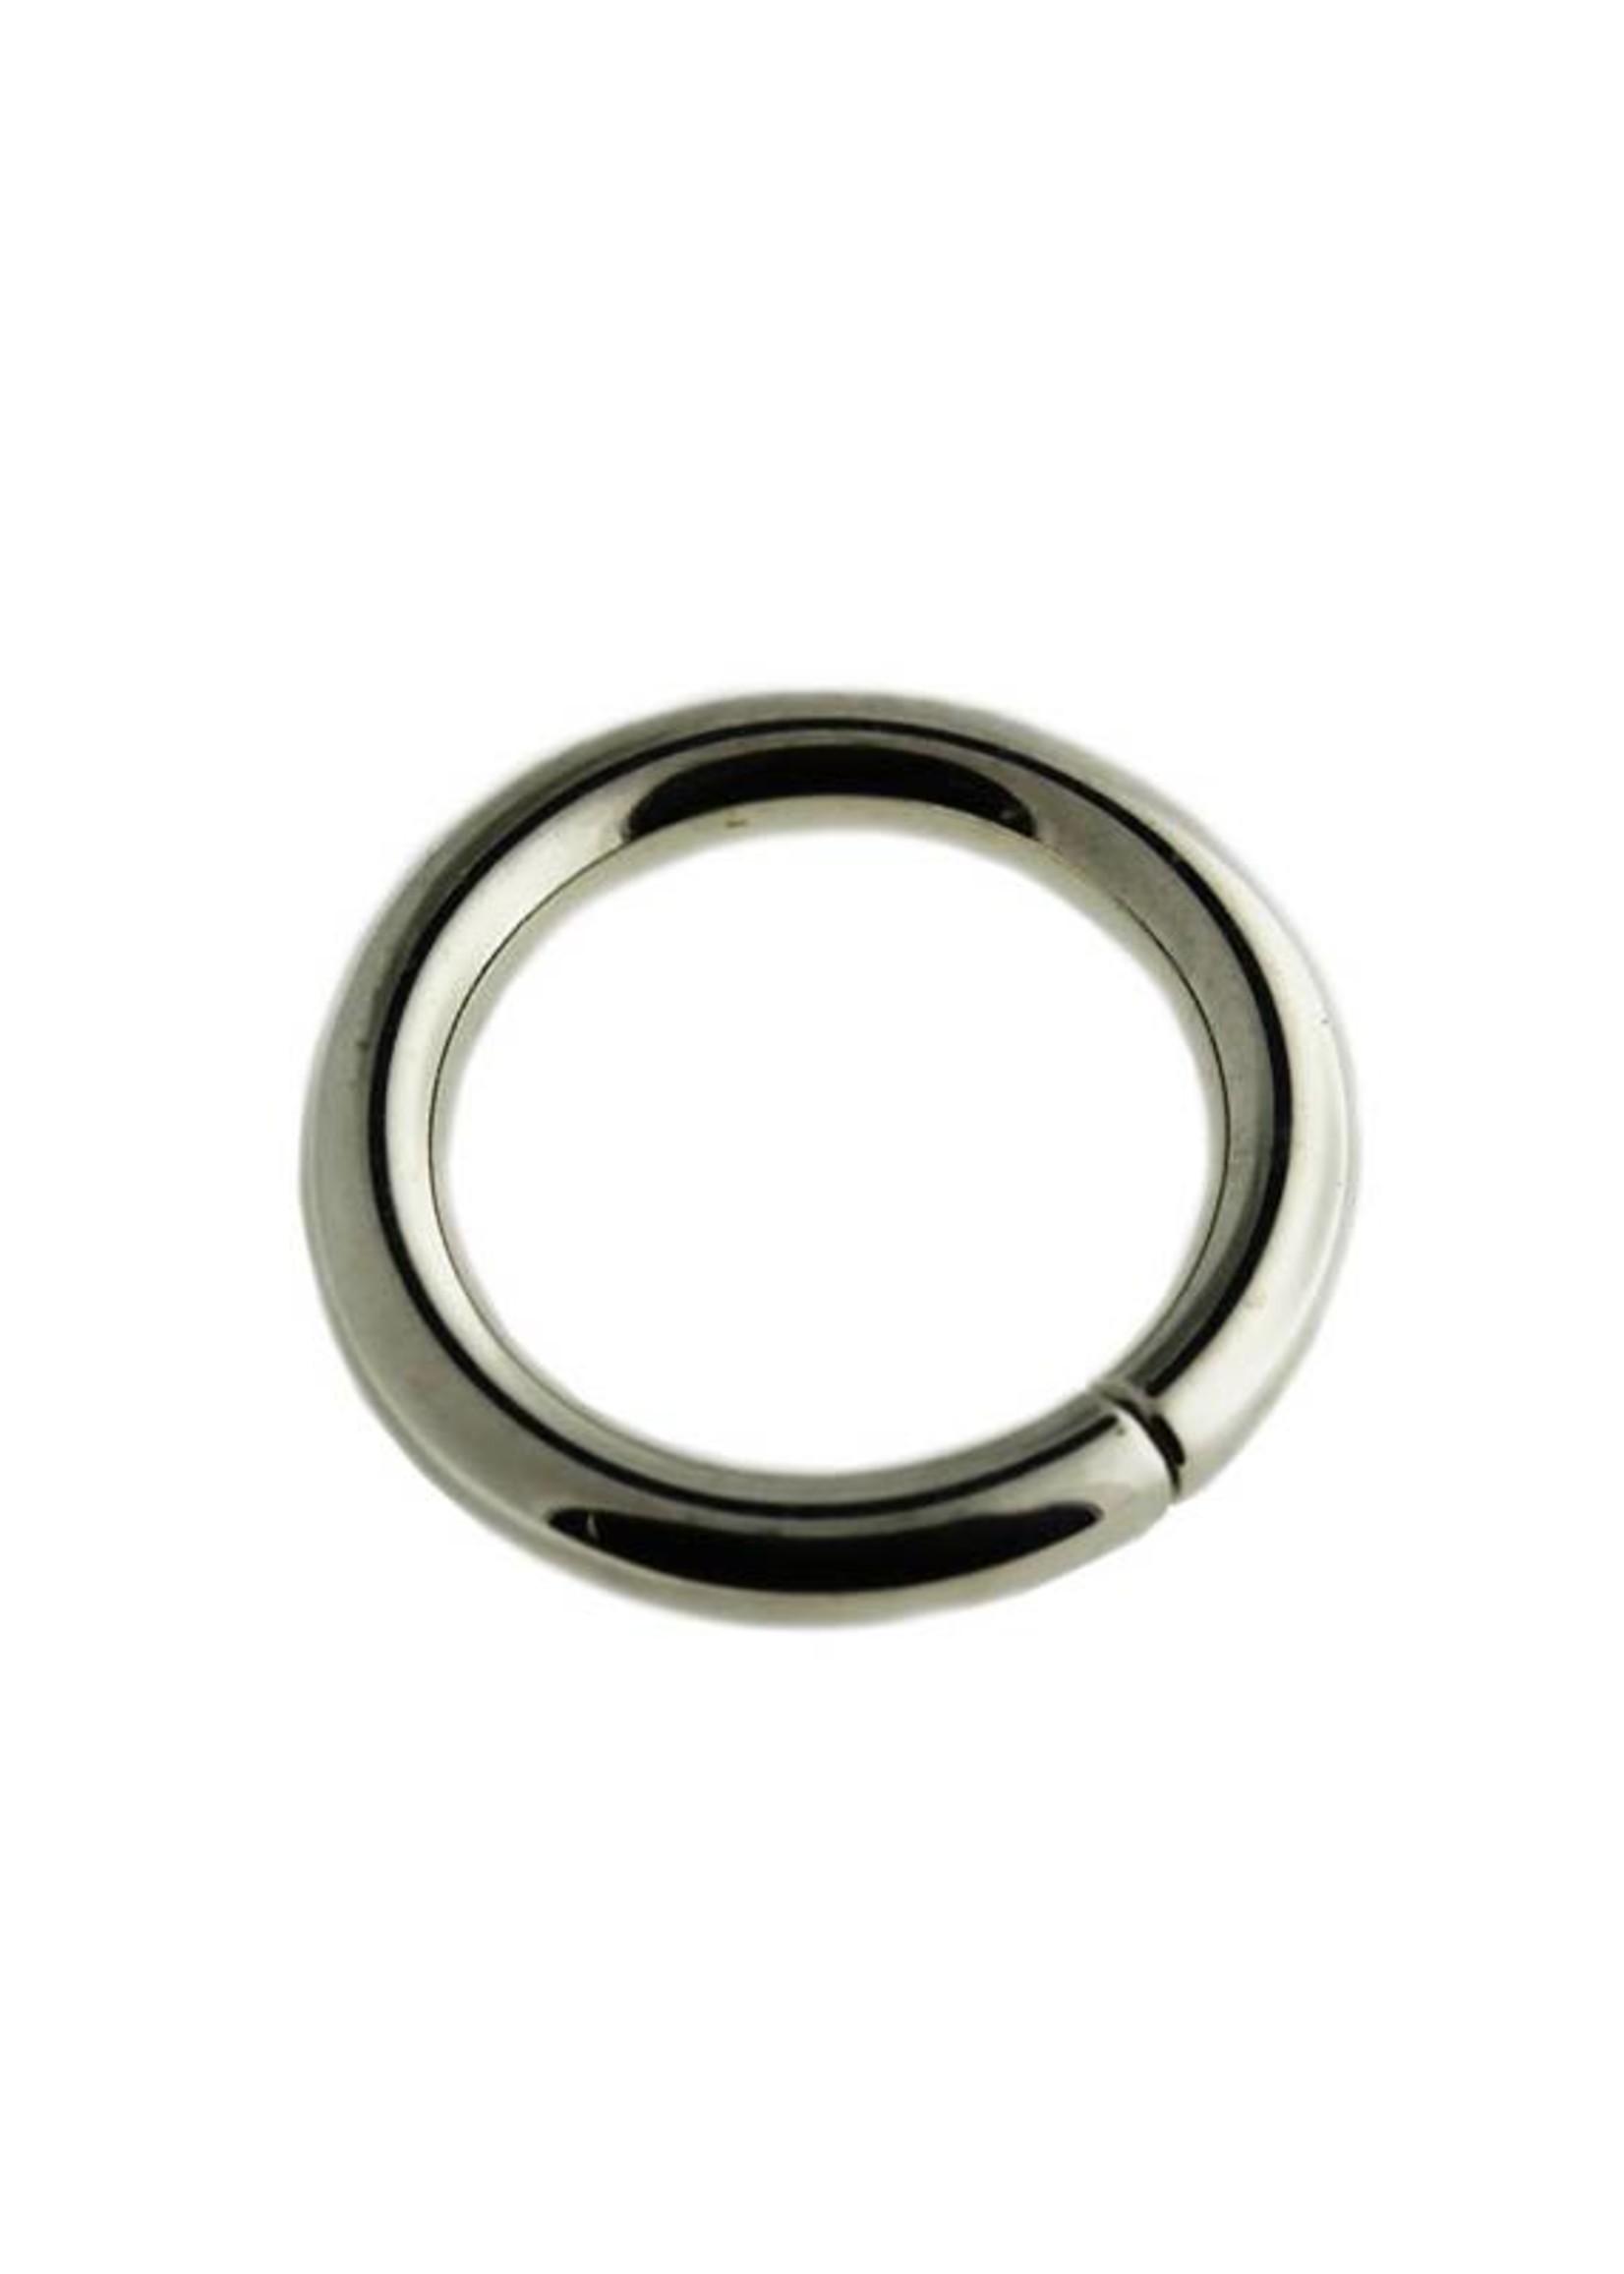 16g BLK Ni Seam Ring